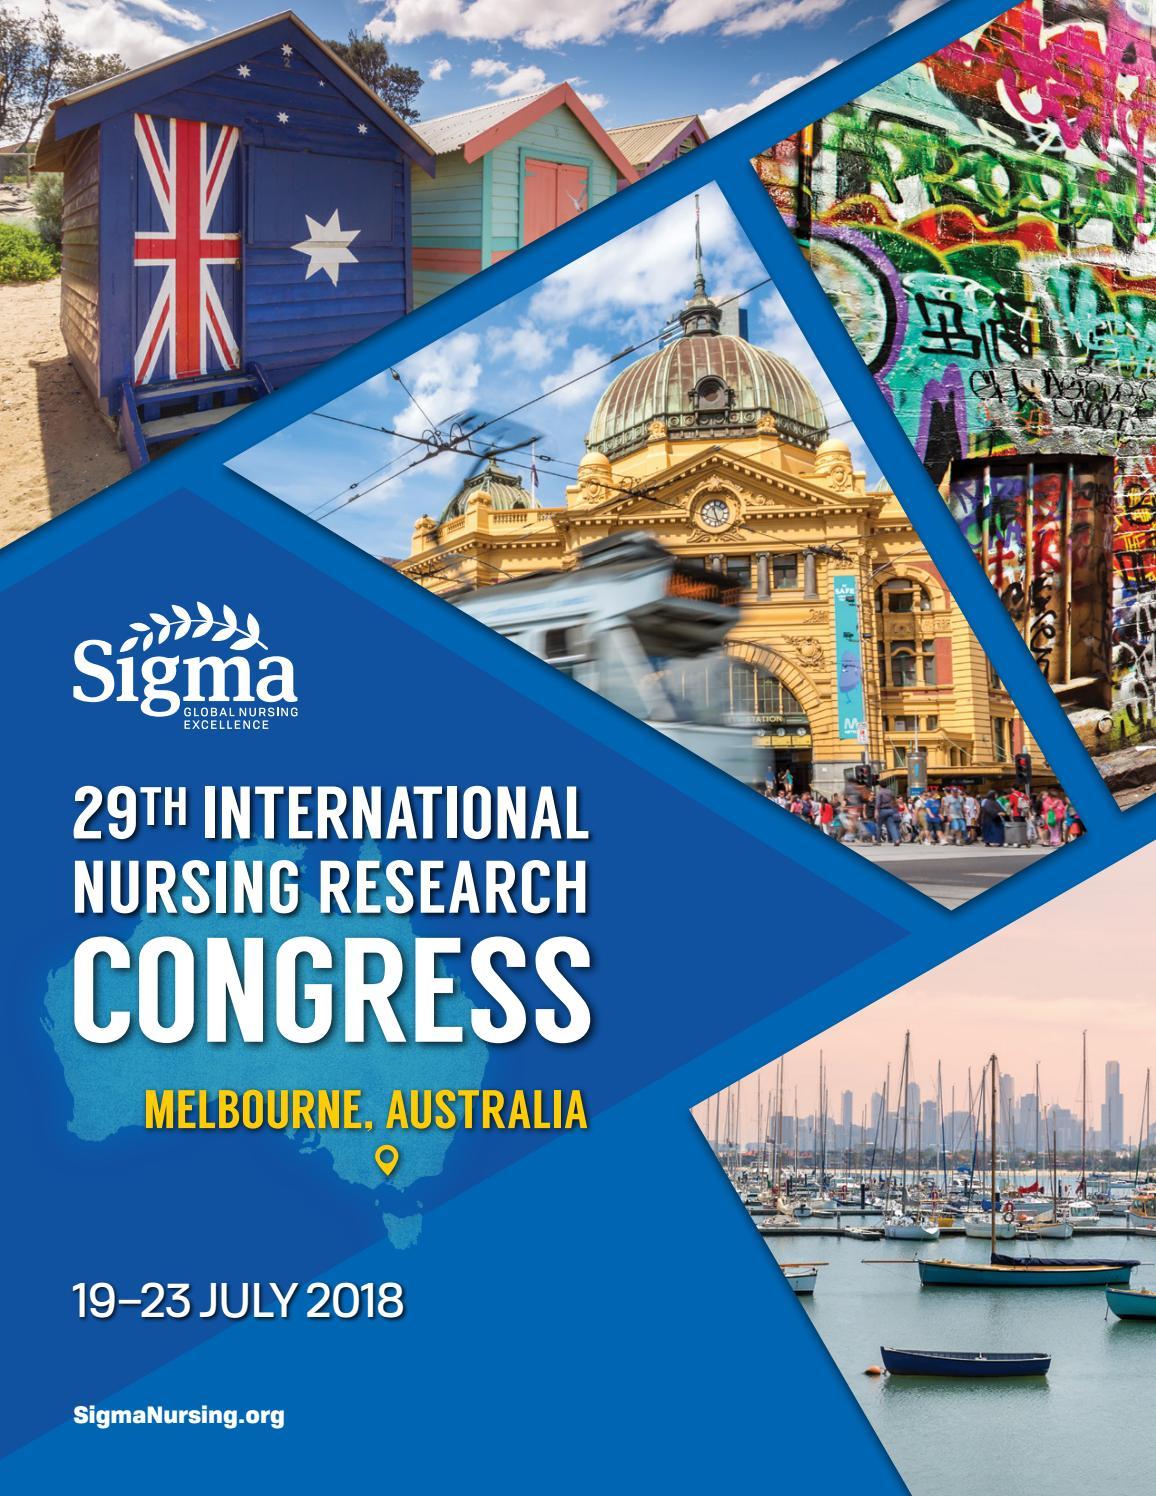 e85b9e77dde0 29th International Nursing Research Congress by Sigma Theta Tau  International Honor Society of Nursing - issuu